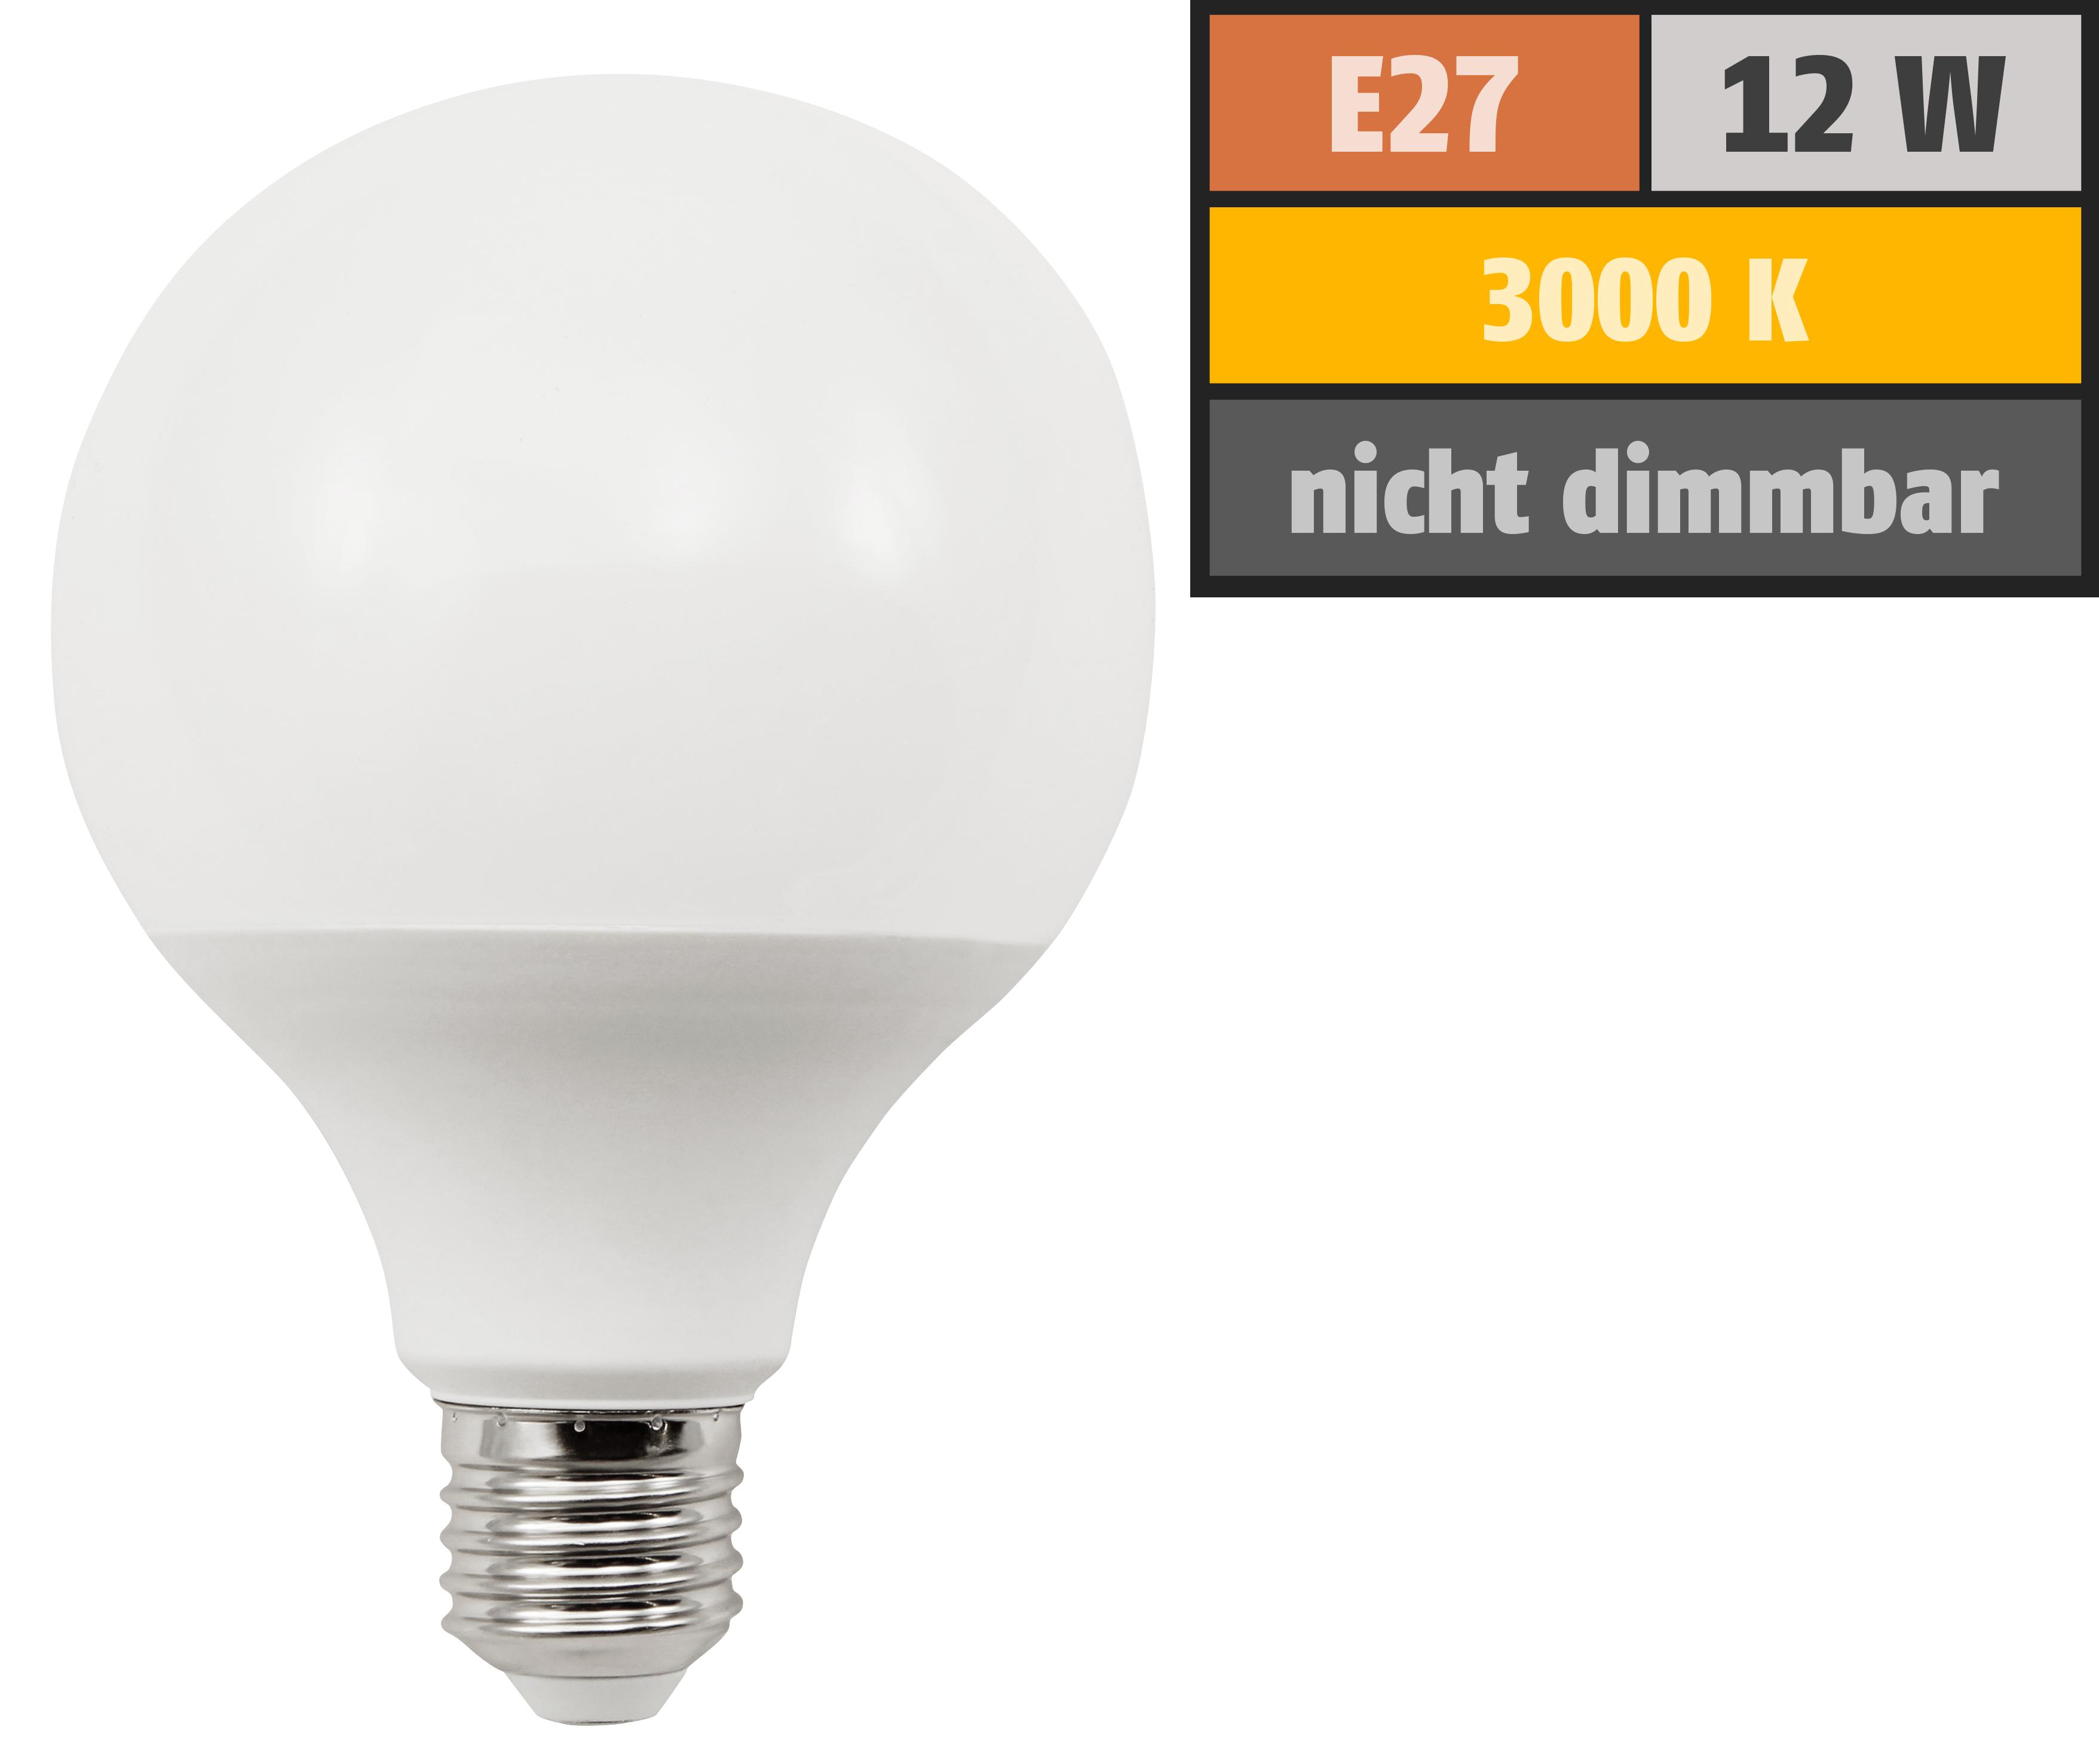 LED Globelampe McShine, E27, 12W, 1055lm, warmweiß